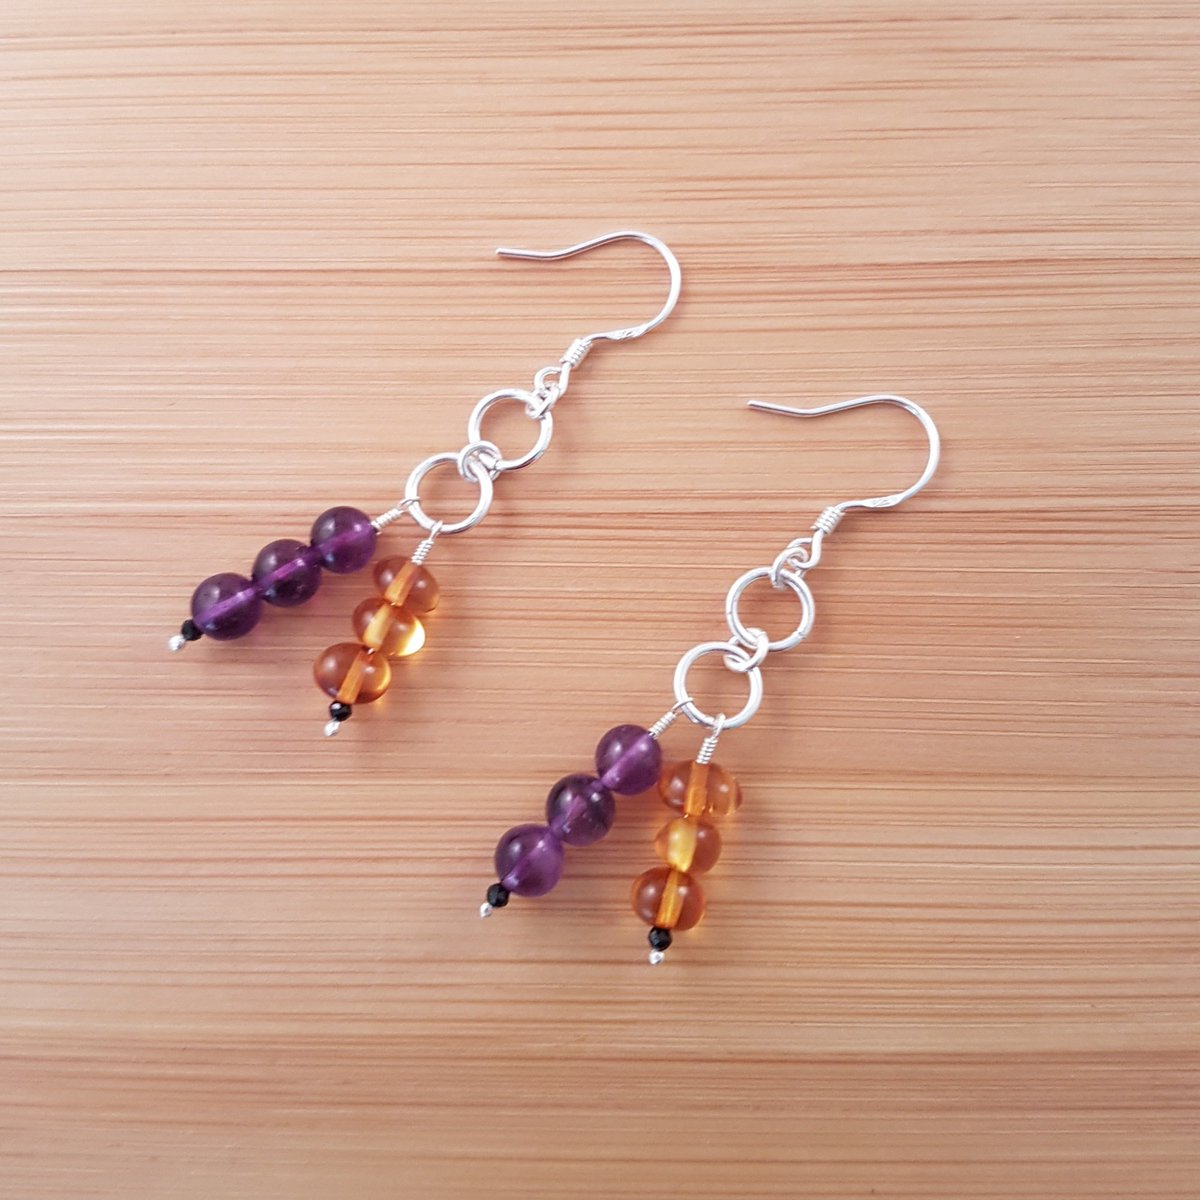 Amethyst and amber earrings